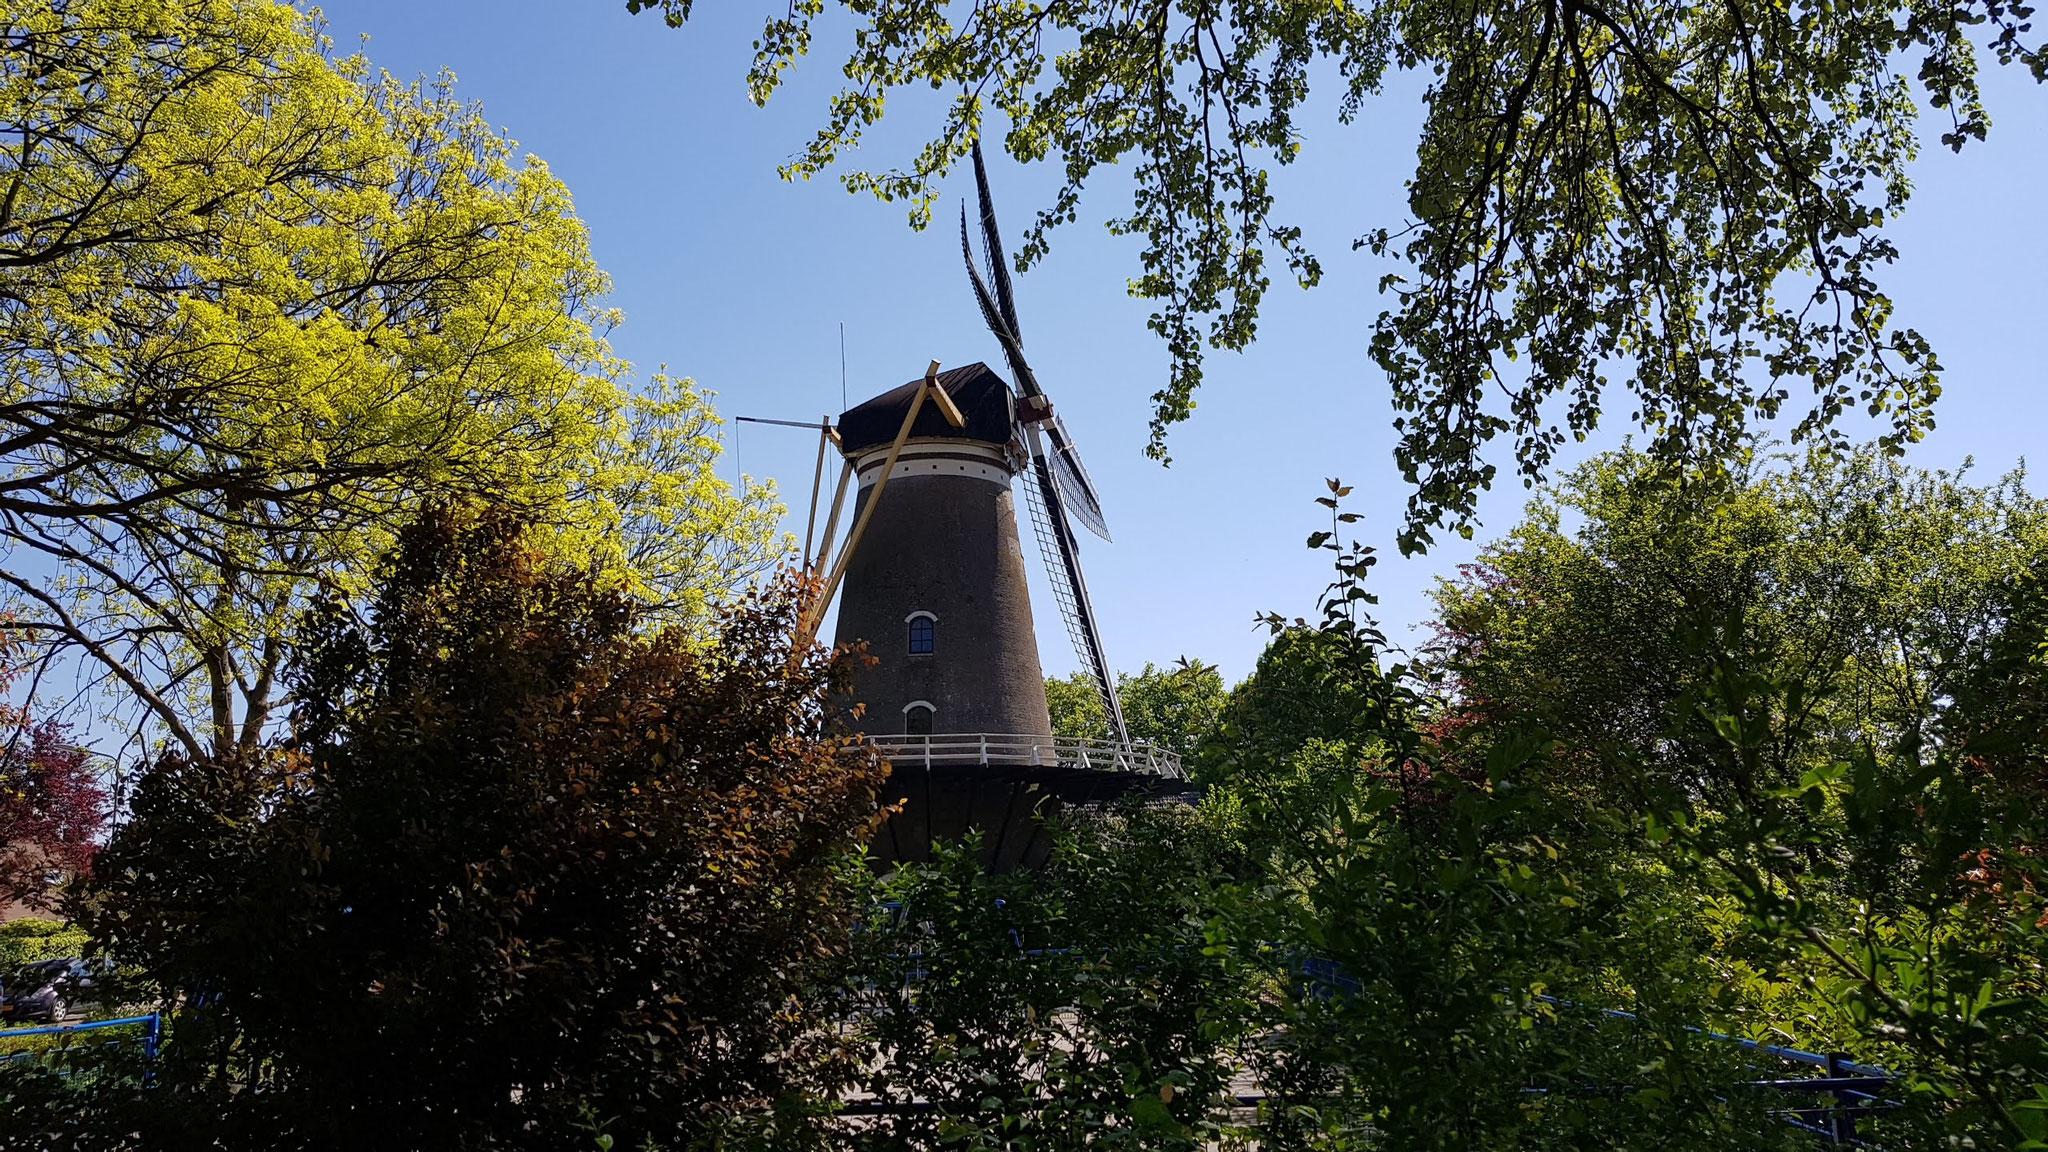 Mühle in Middelburg